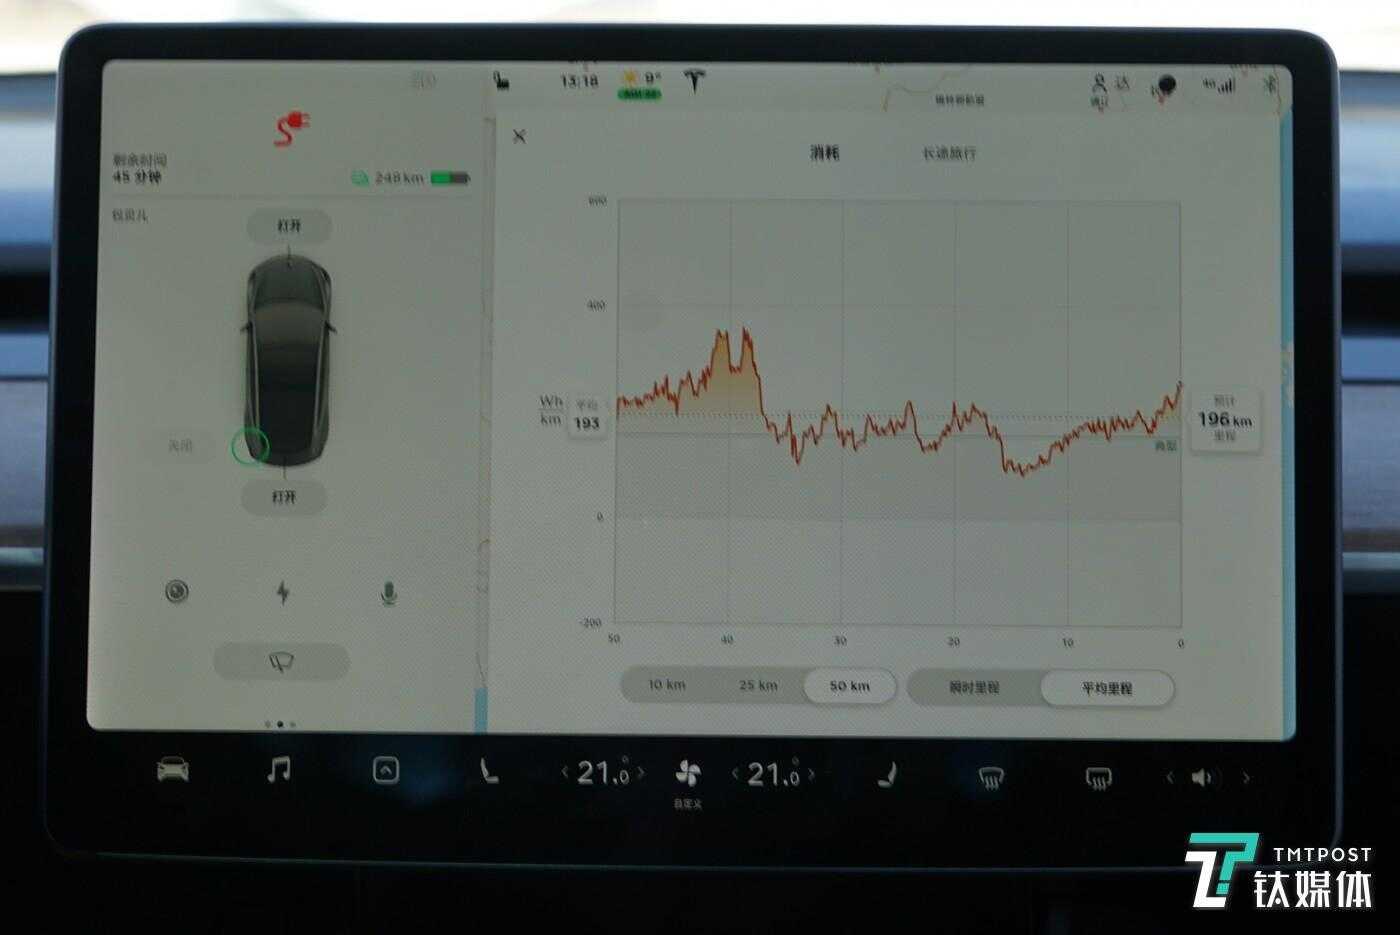 Model 3 需求旺盛,补能体系或是缓解续航焦虑的关键